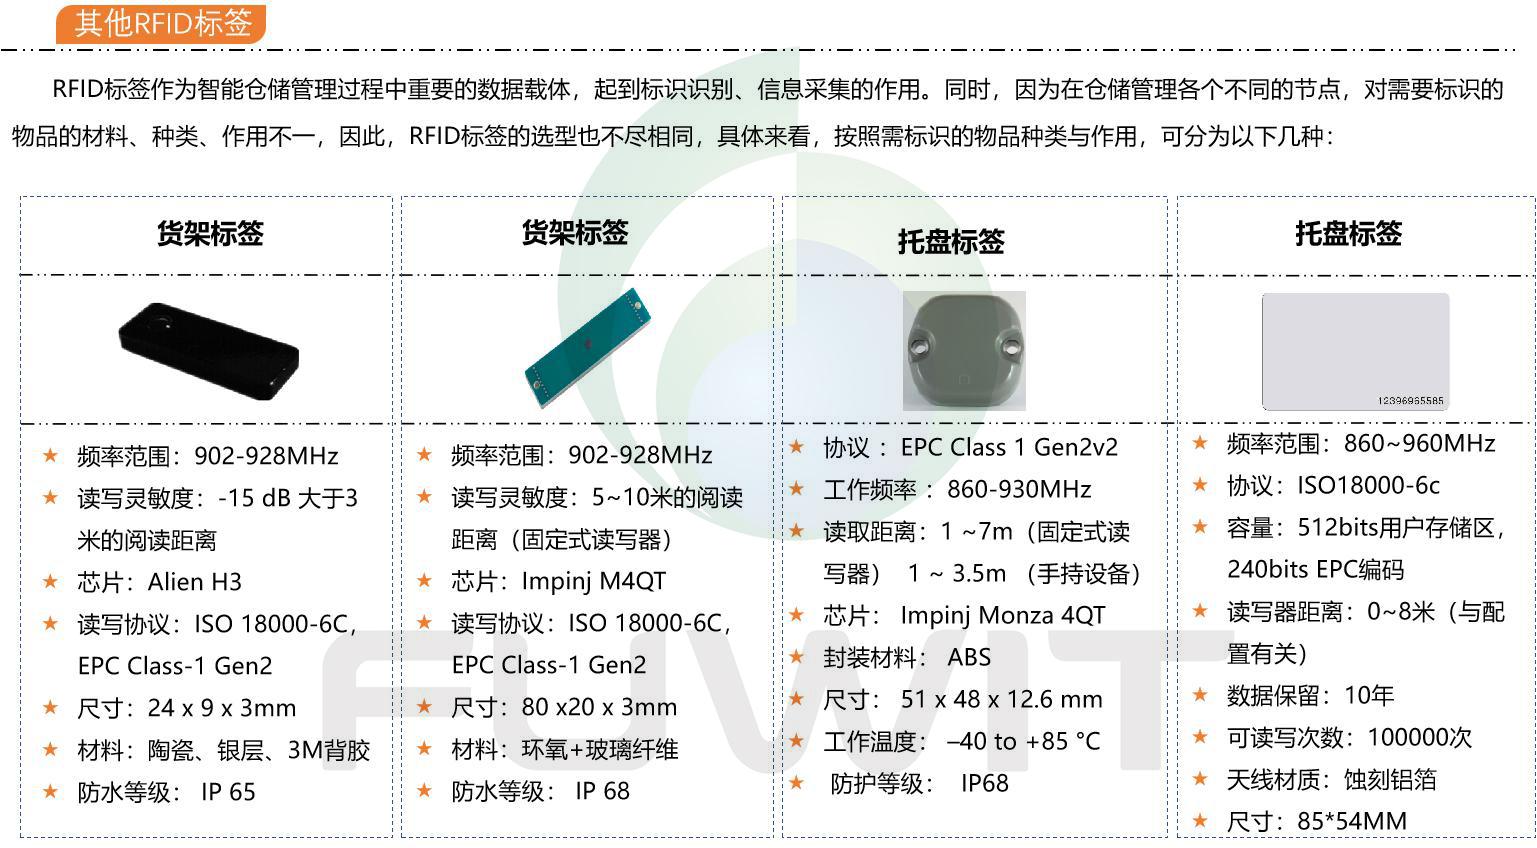 RFID产品设备